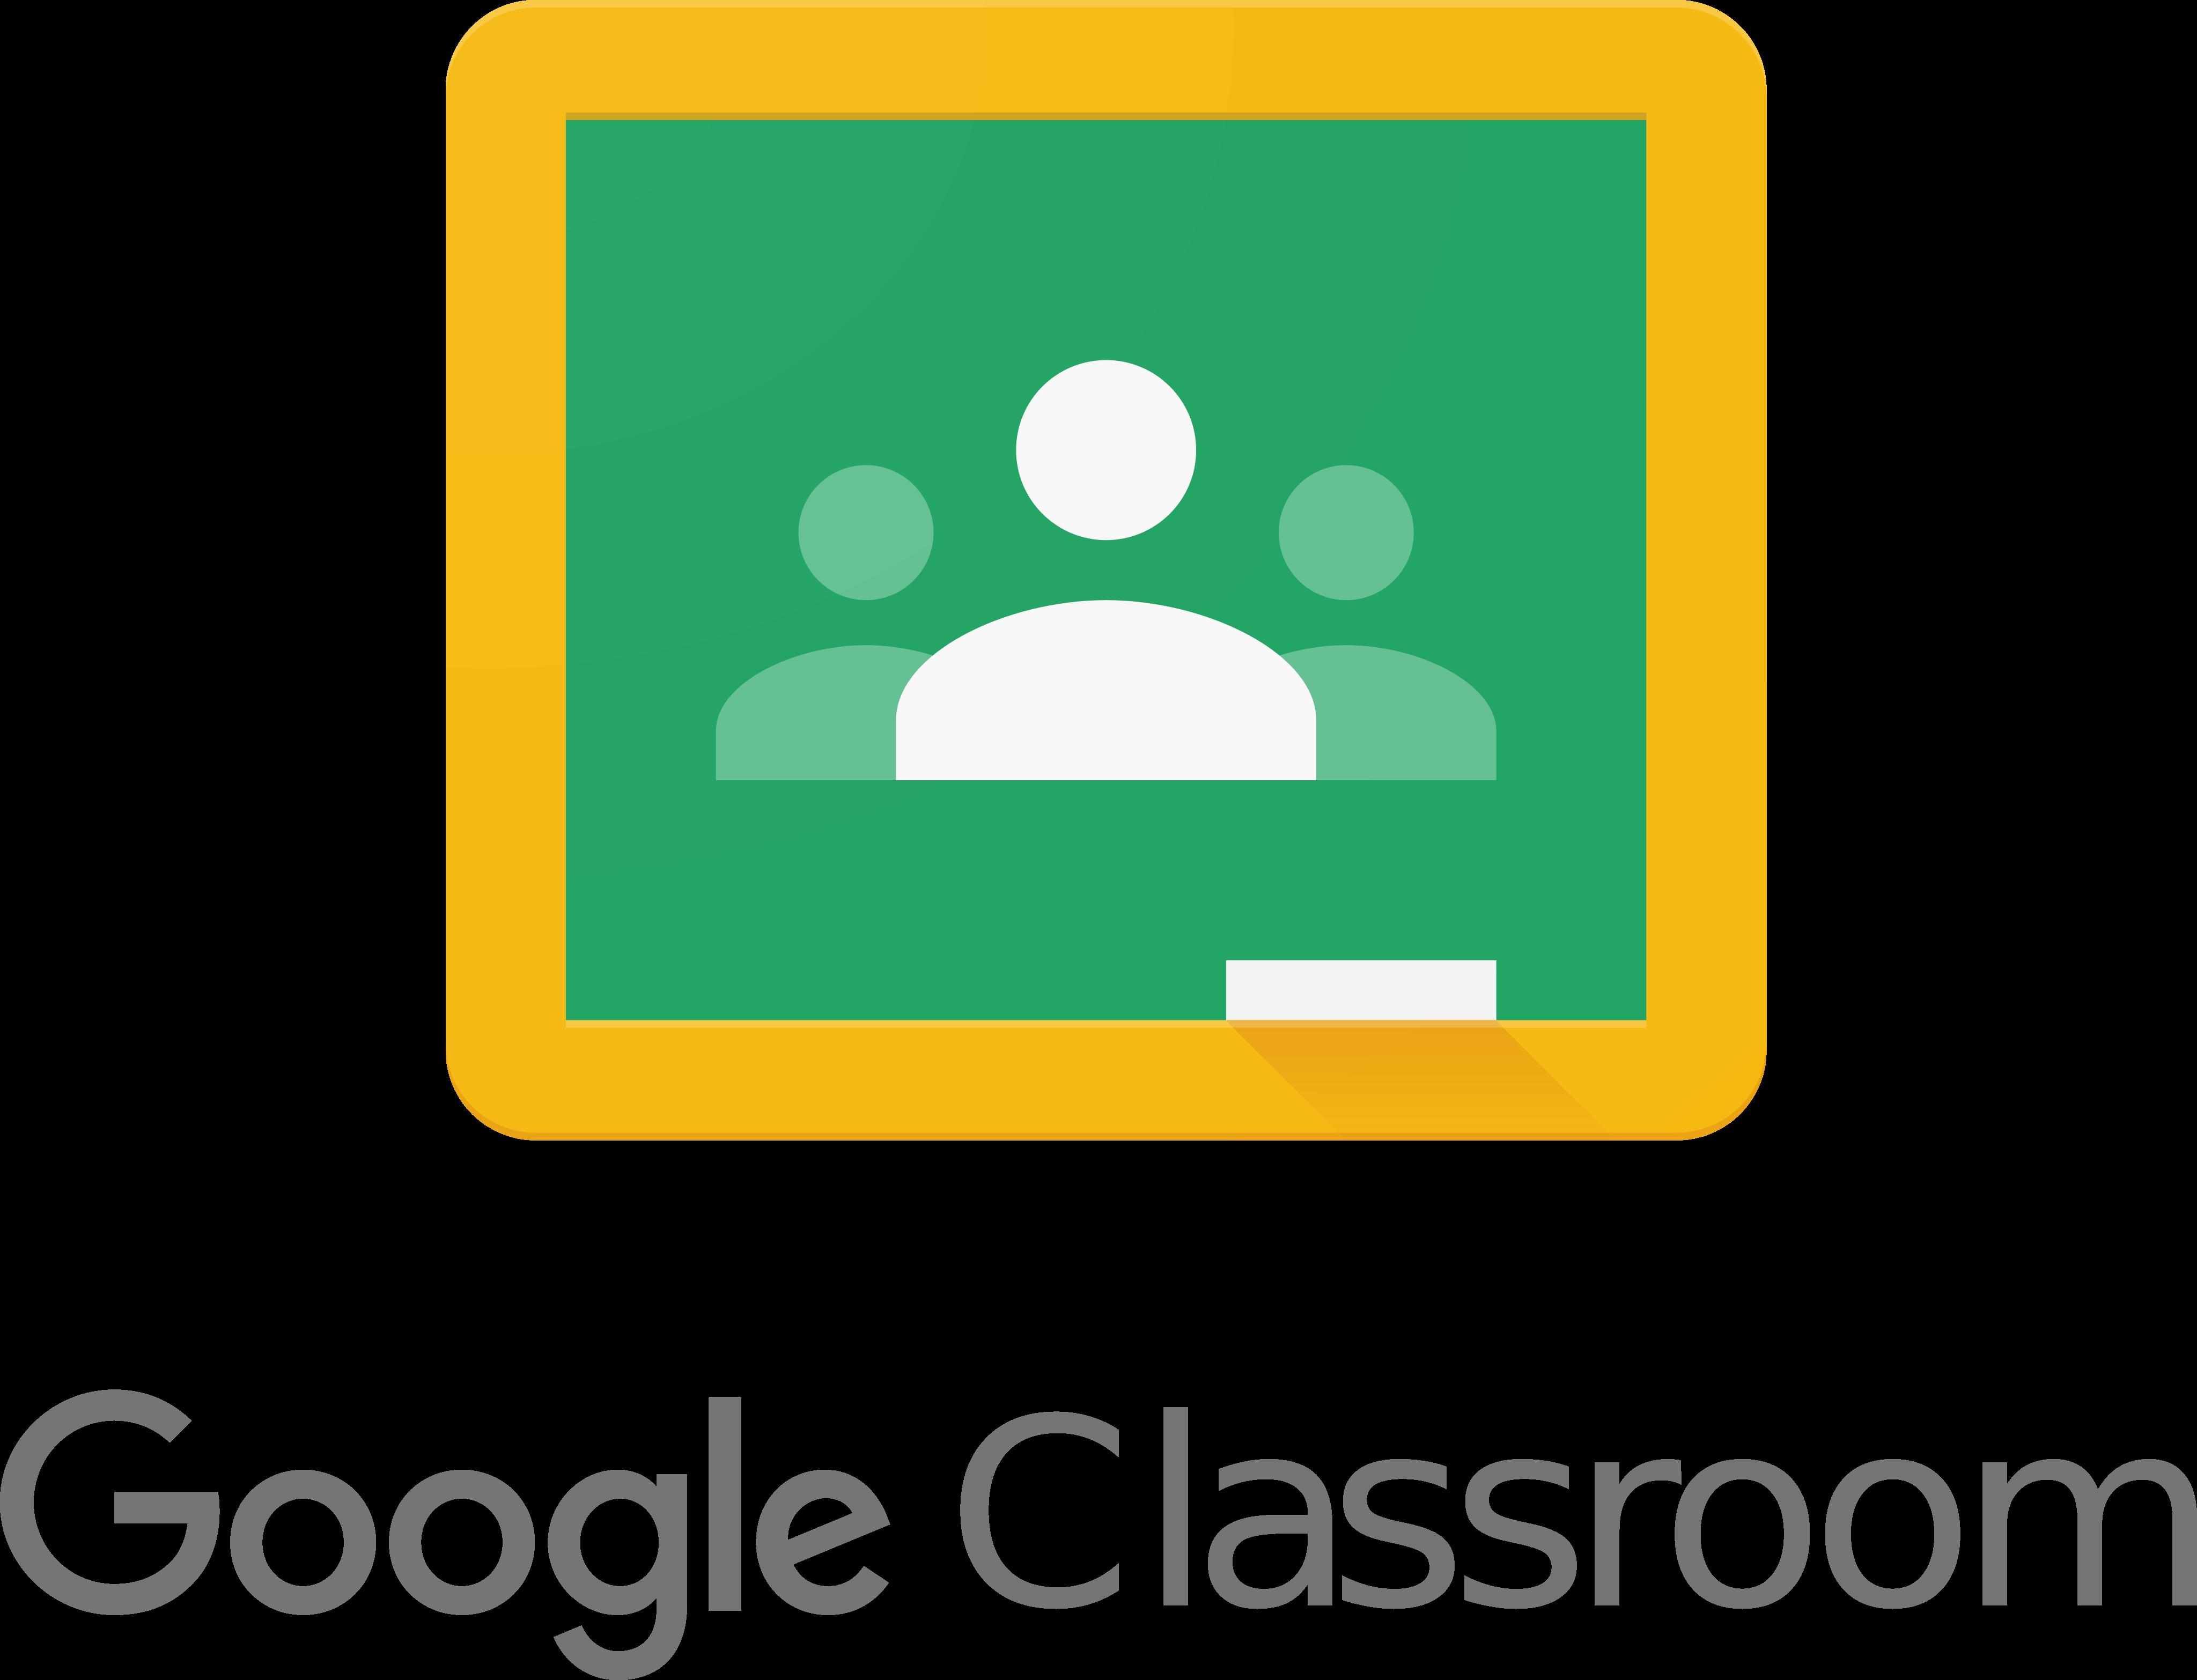 google classroom logo 1 - Google Classroom Logo